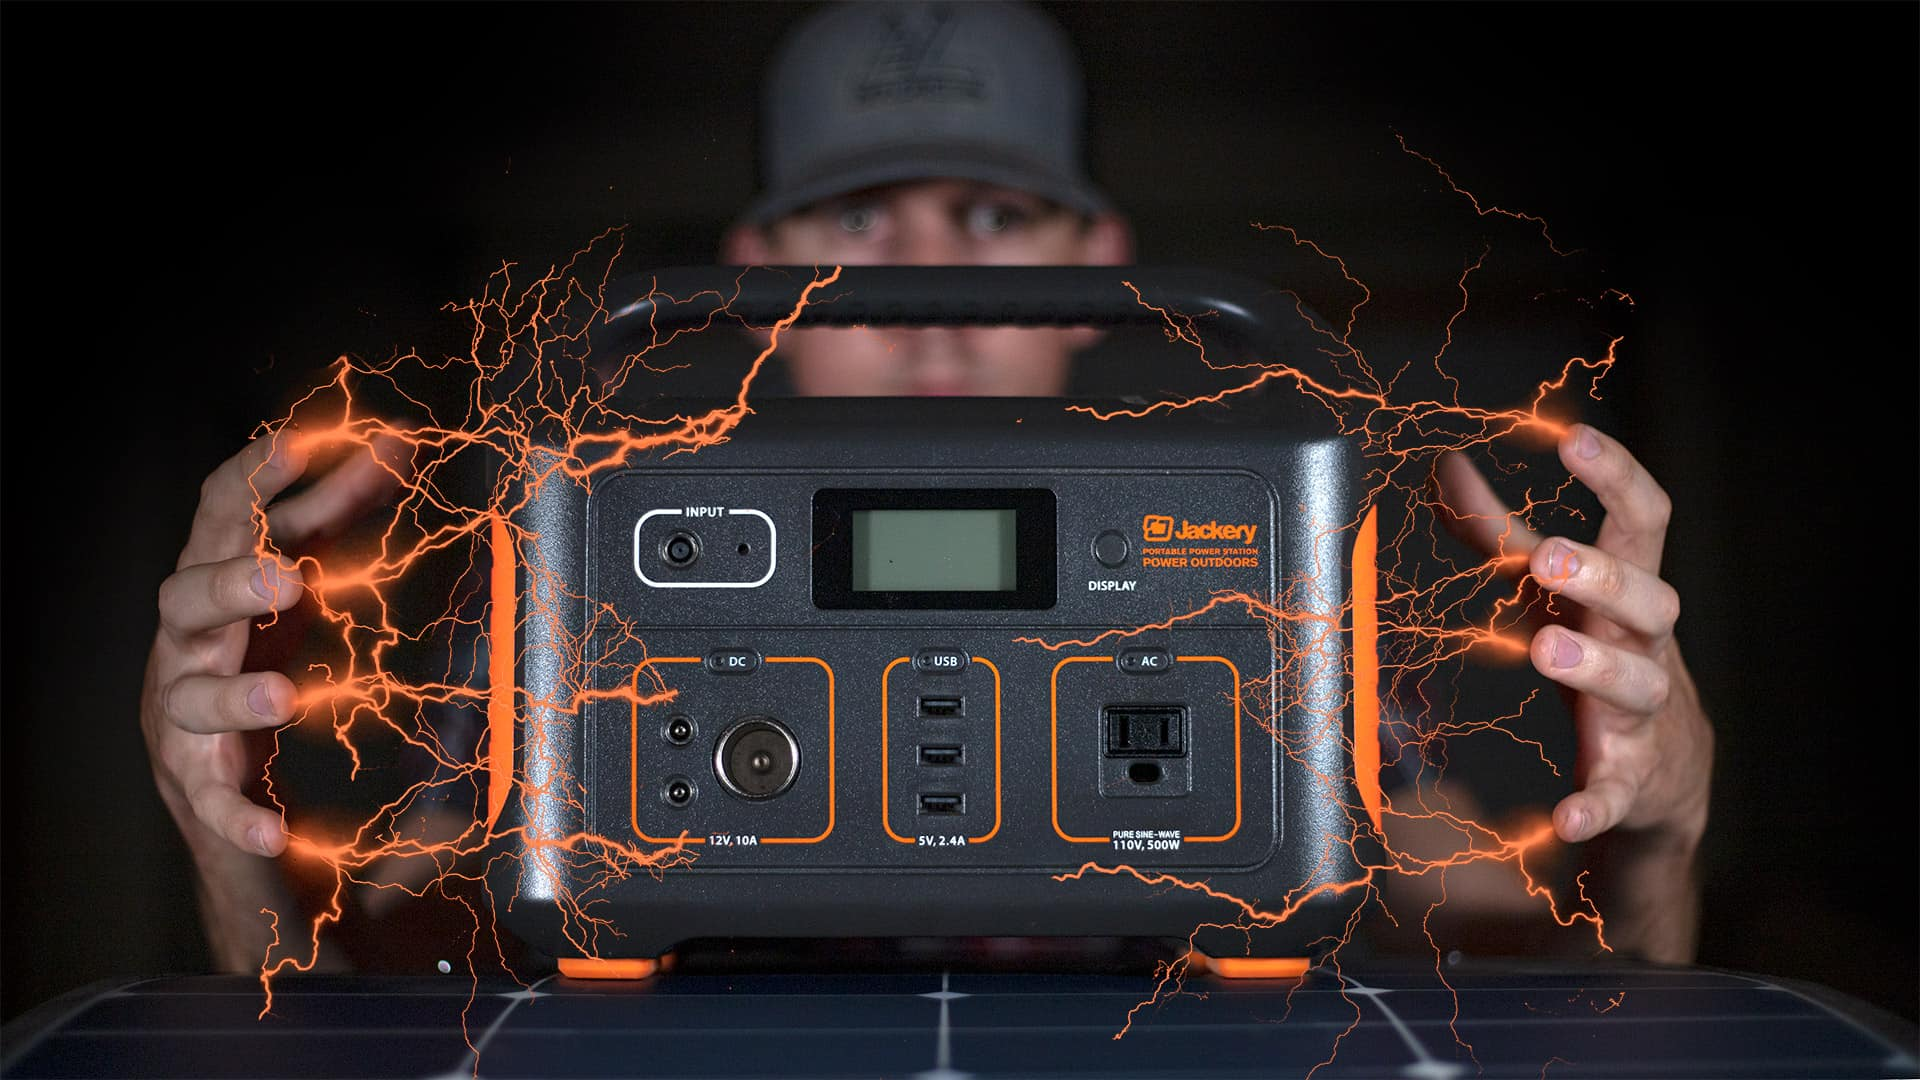 Jackery Explorer 500 Portable Power Station Review